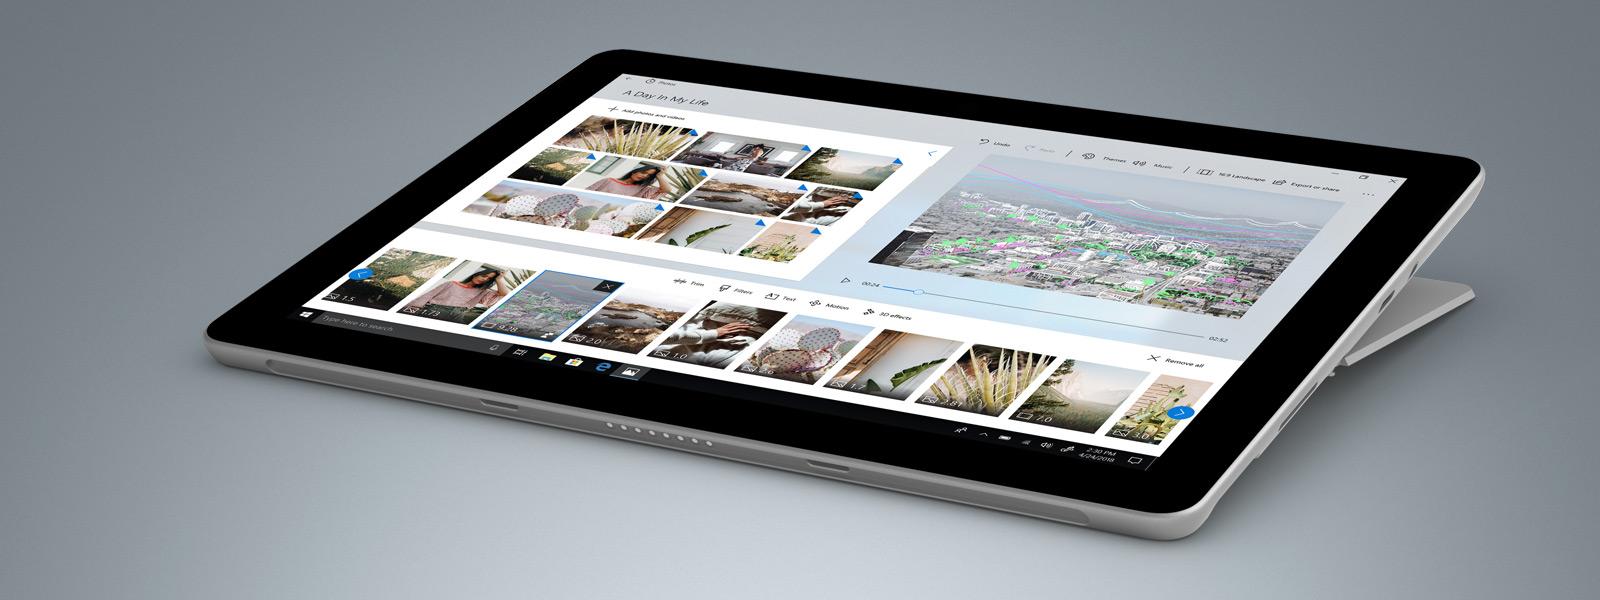 Surface Go dengan aplikasi Foto